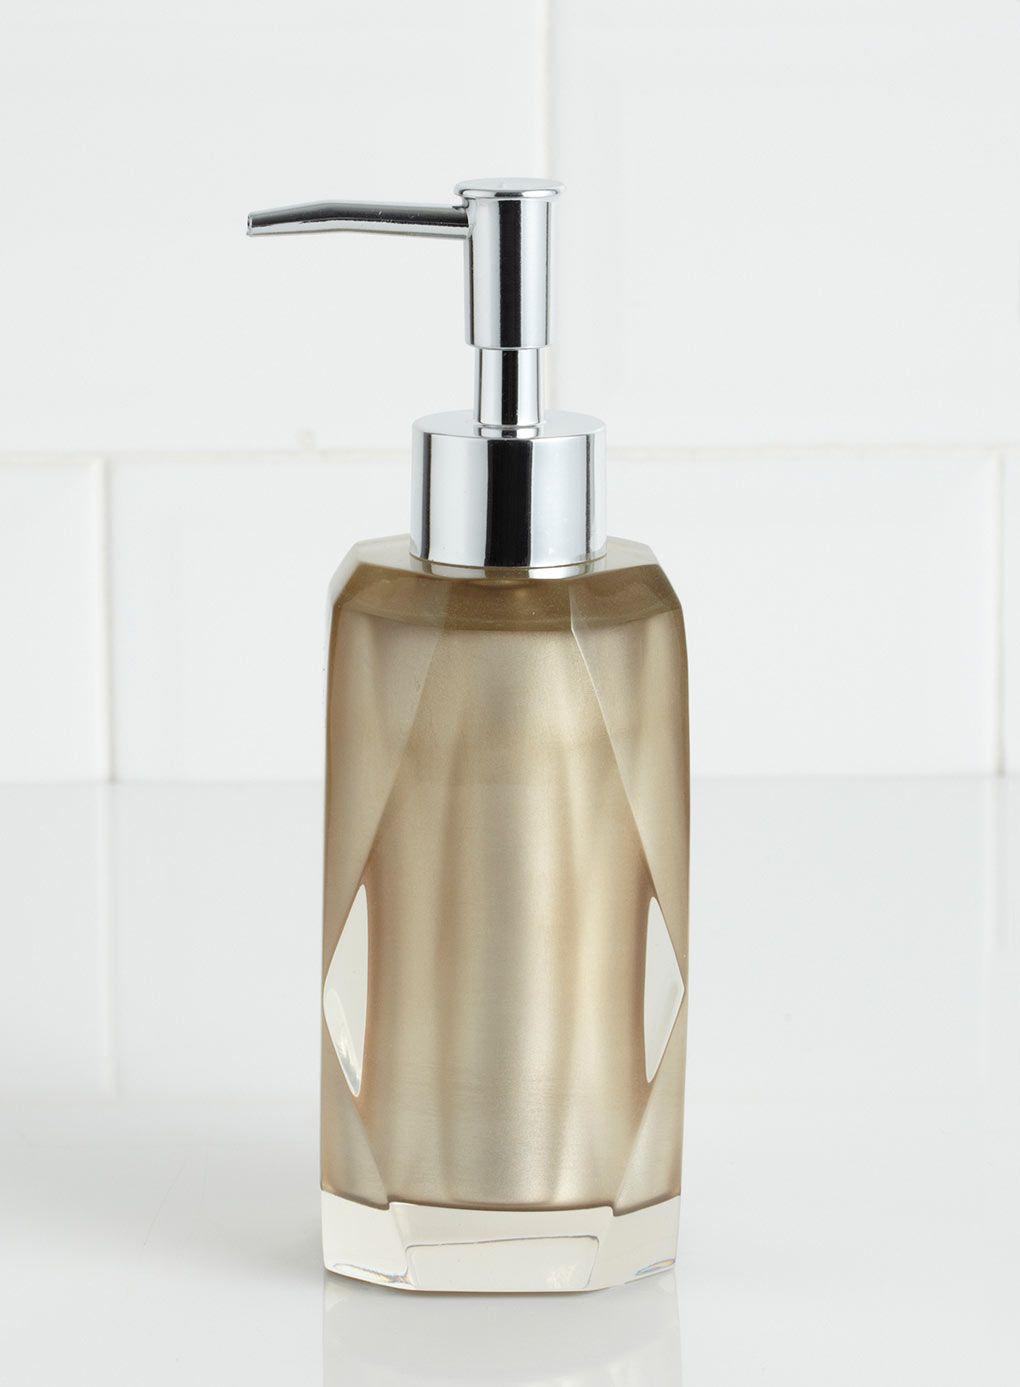 Bhs Bathroom Storage Large Diamante Perfume Bottlebathrm Accessories